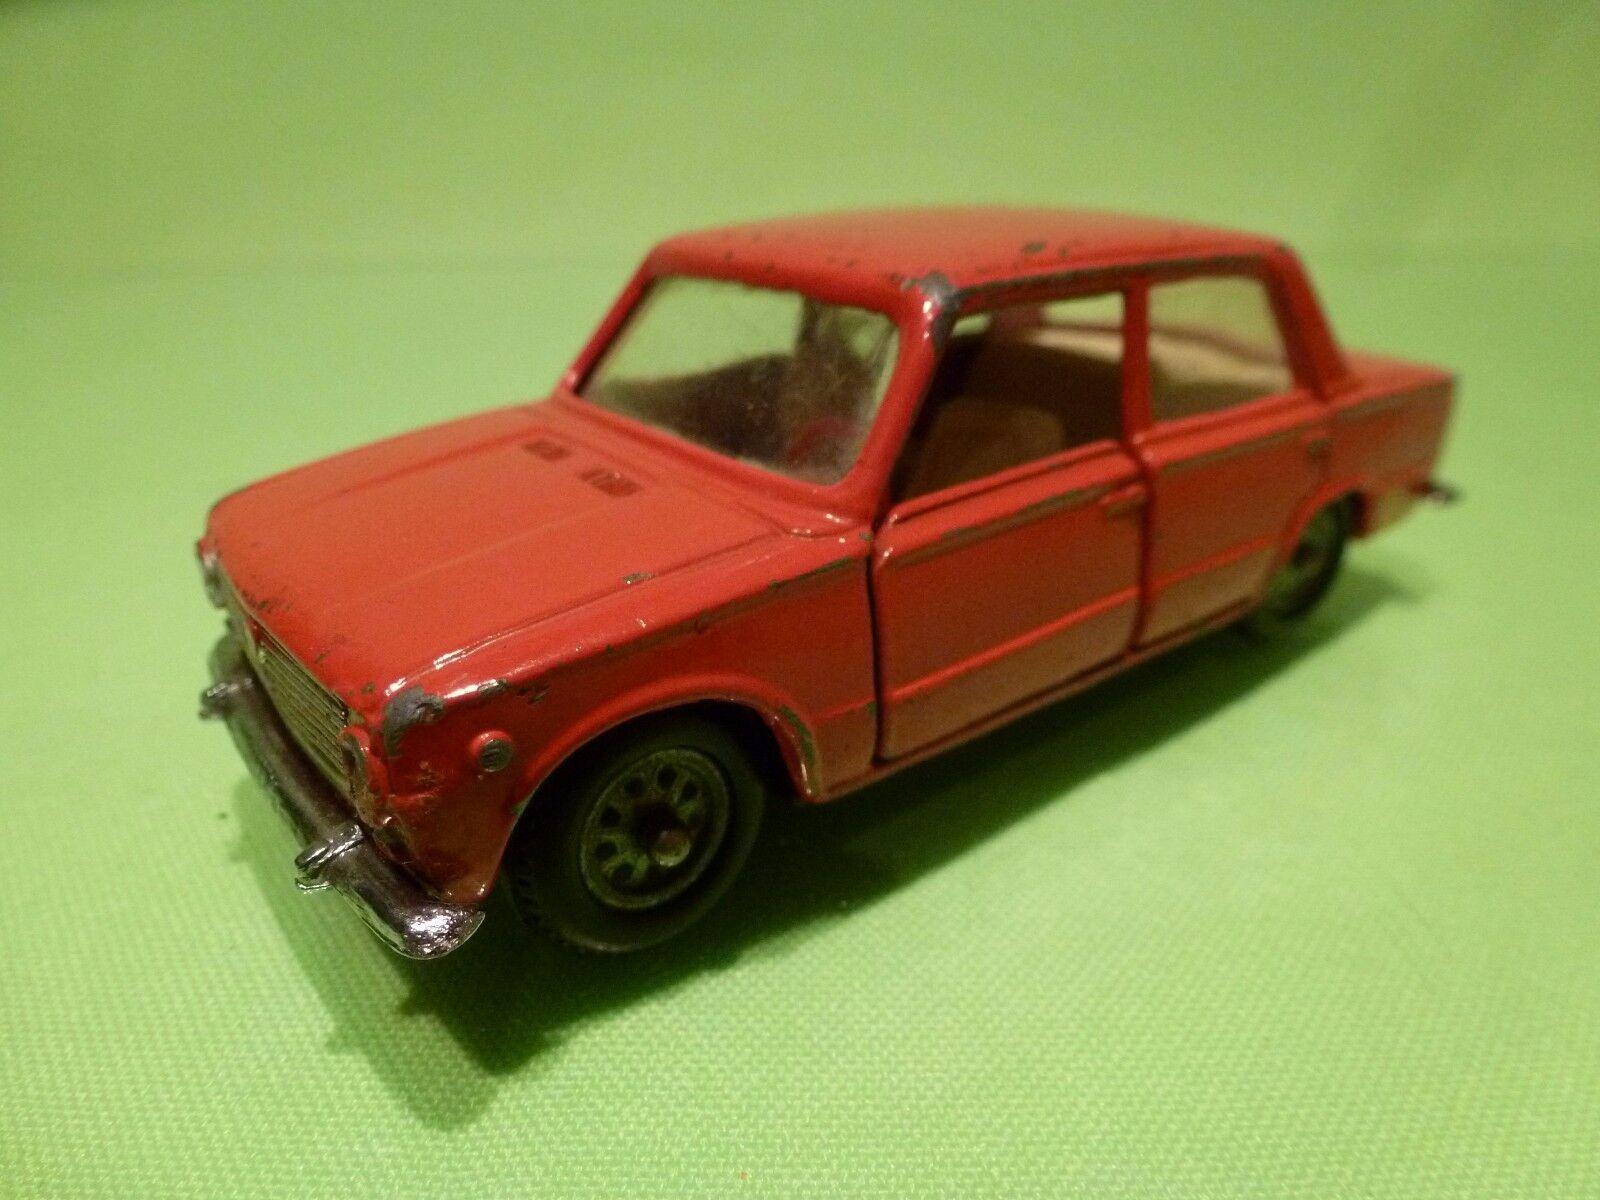 MERCURY FIAT 124 - rouge + BROKEN blanc INTERIOR 1 43 - GOOD CONDITION